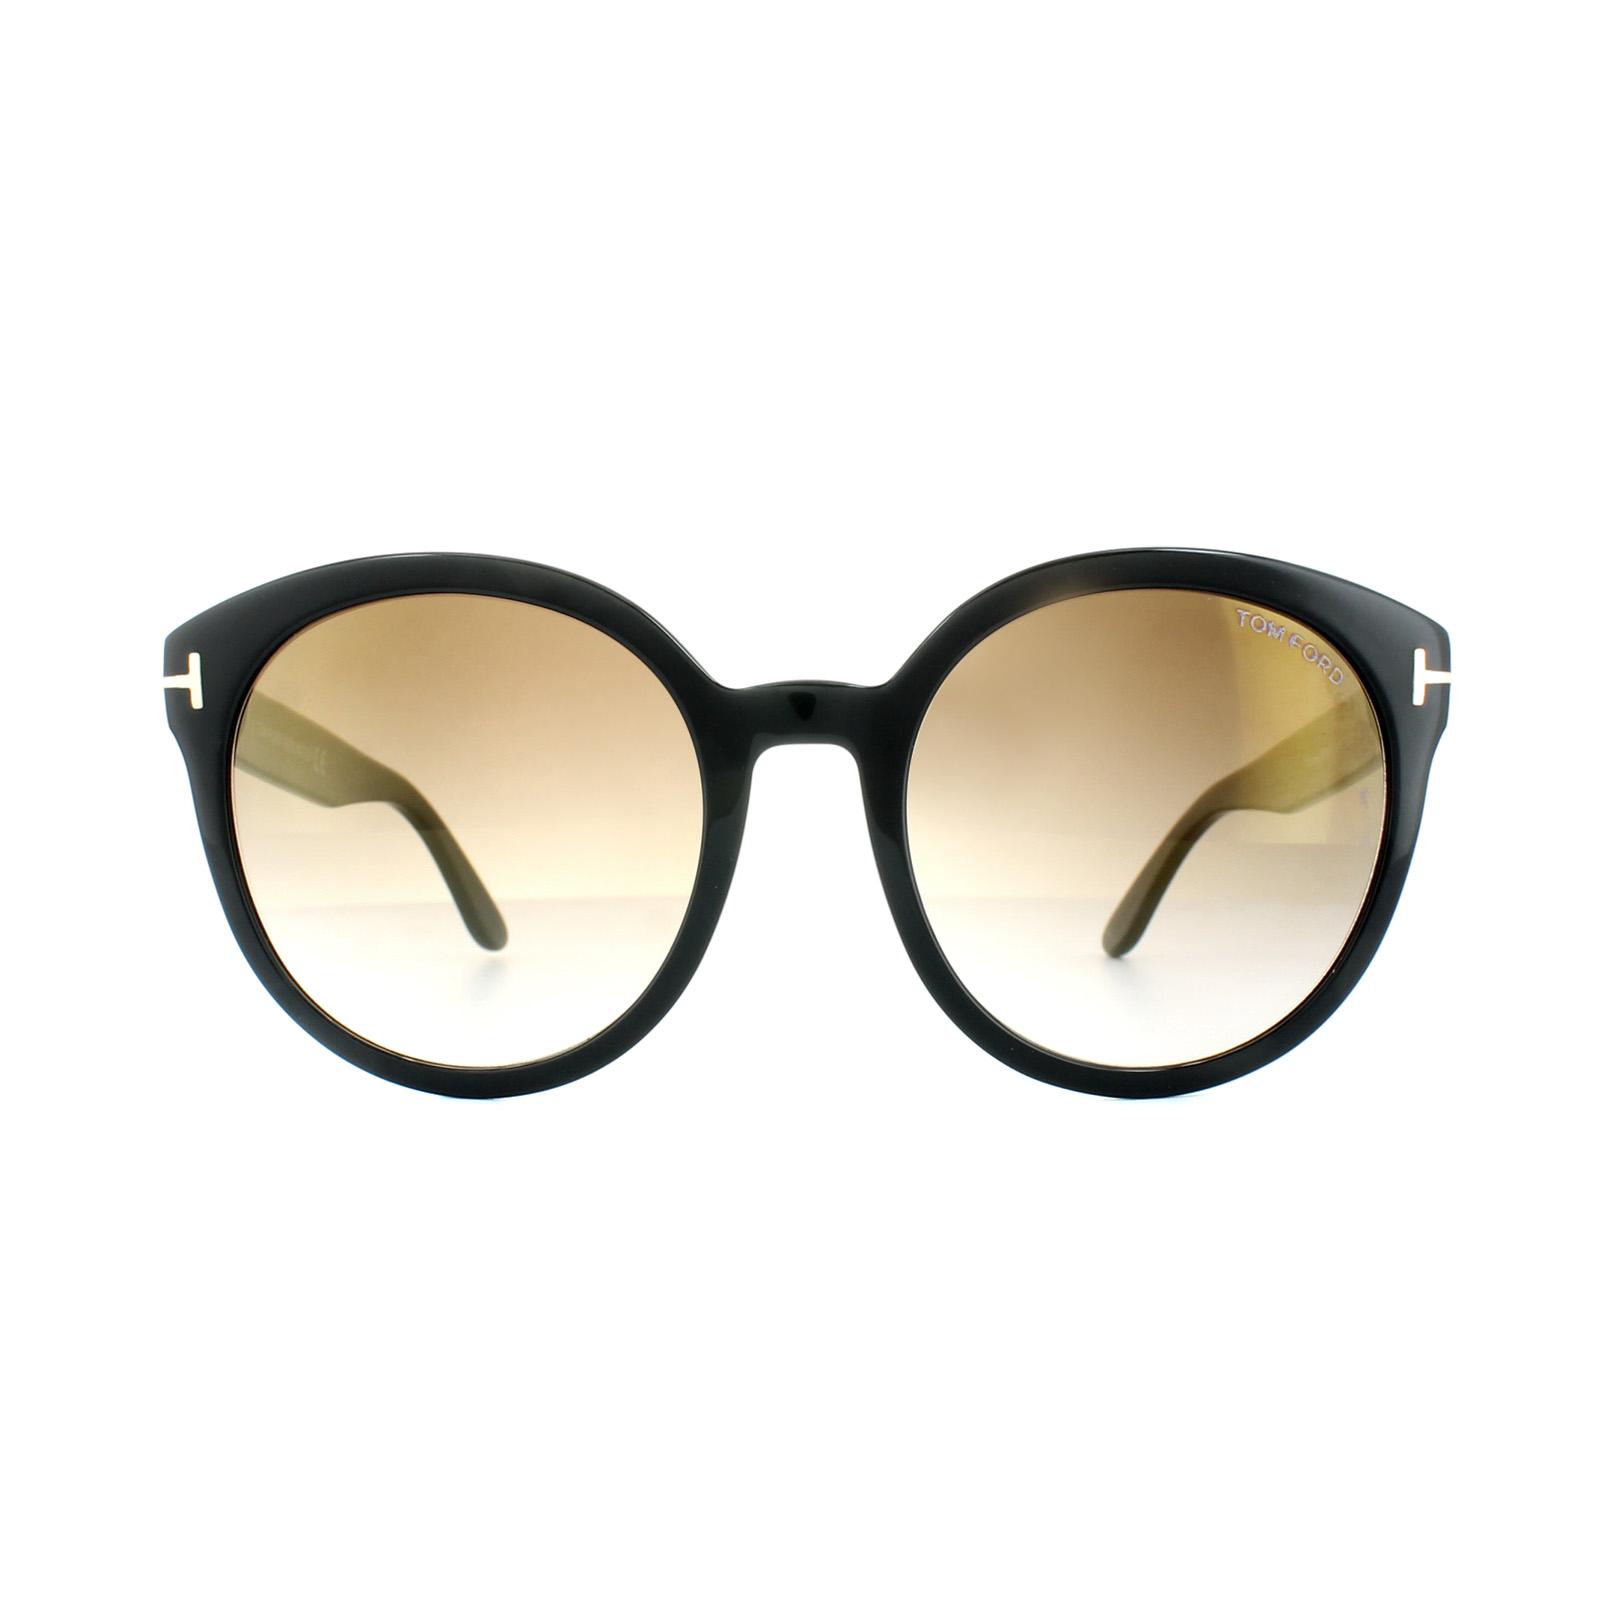 bb37e69cca6 Sentinel Tom Ford Sunglasses 0503 Philippa 01G Shiny Black Brown Mirror